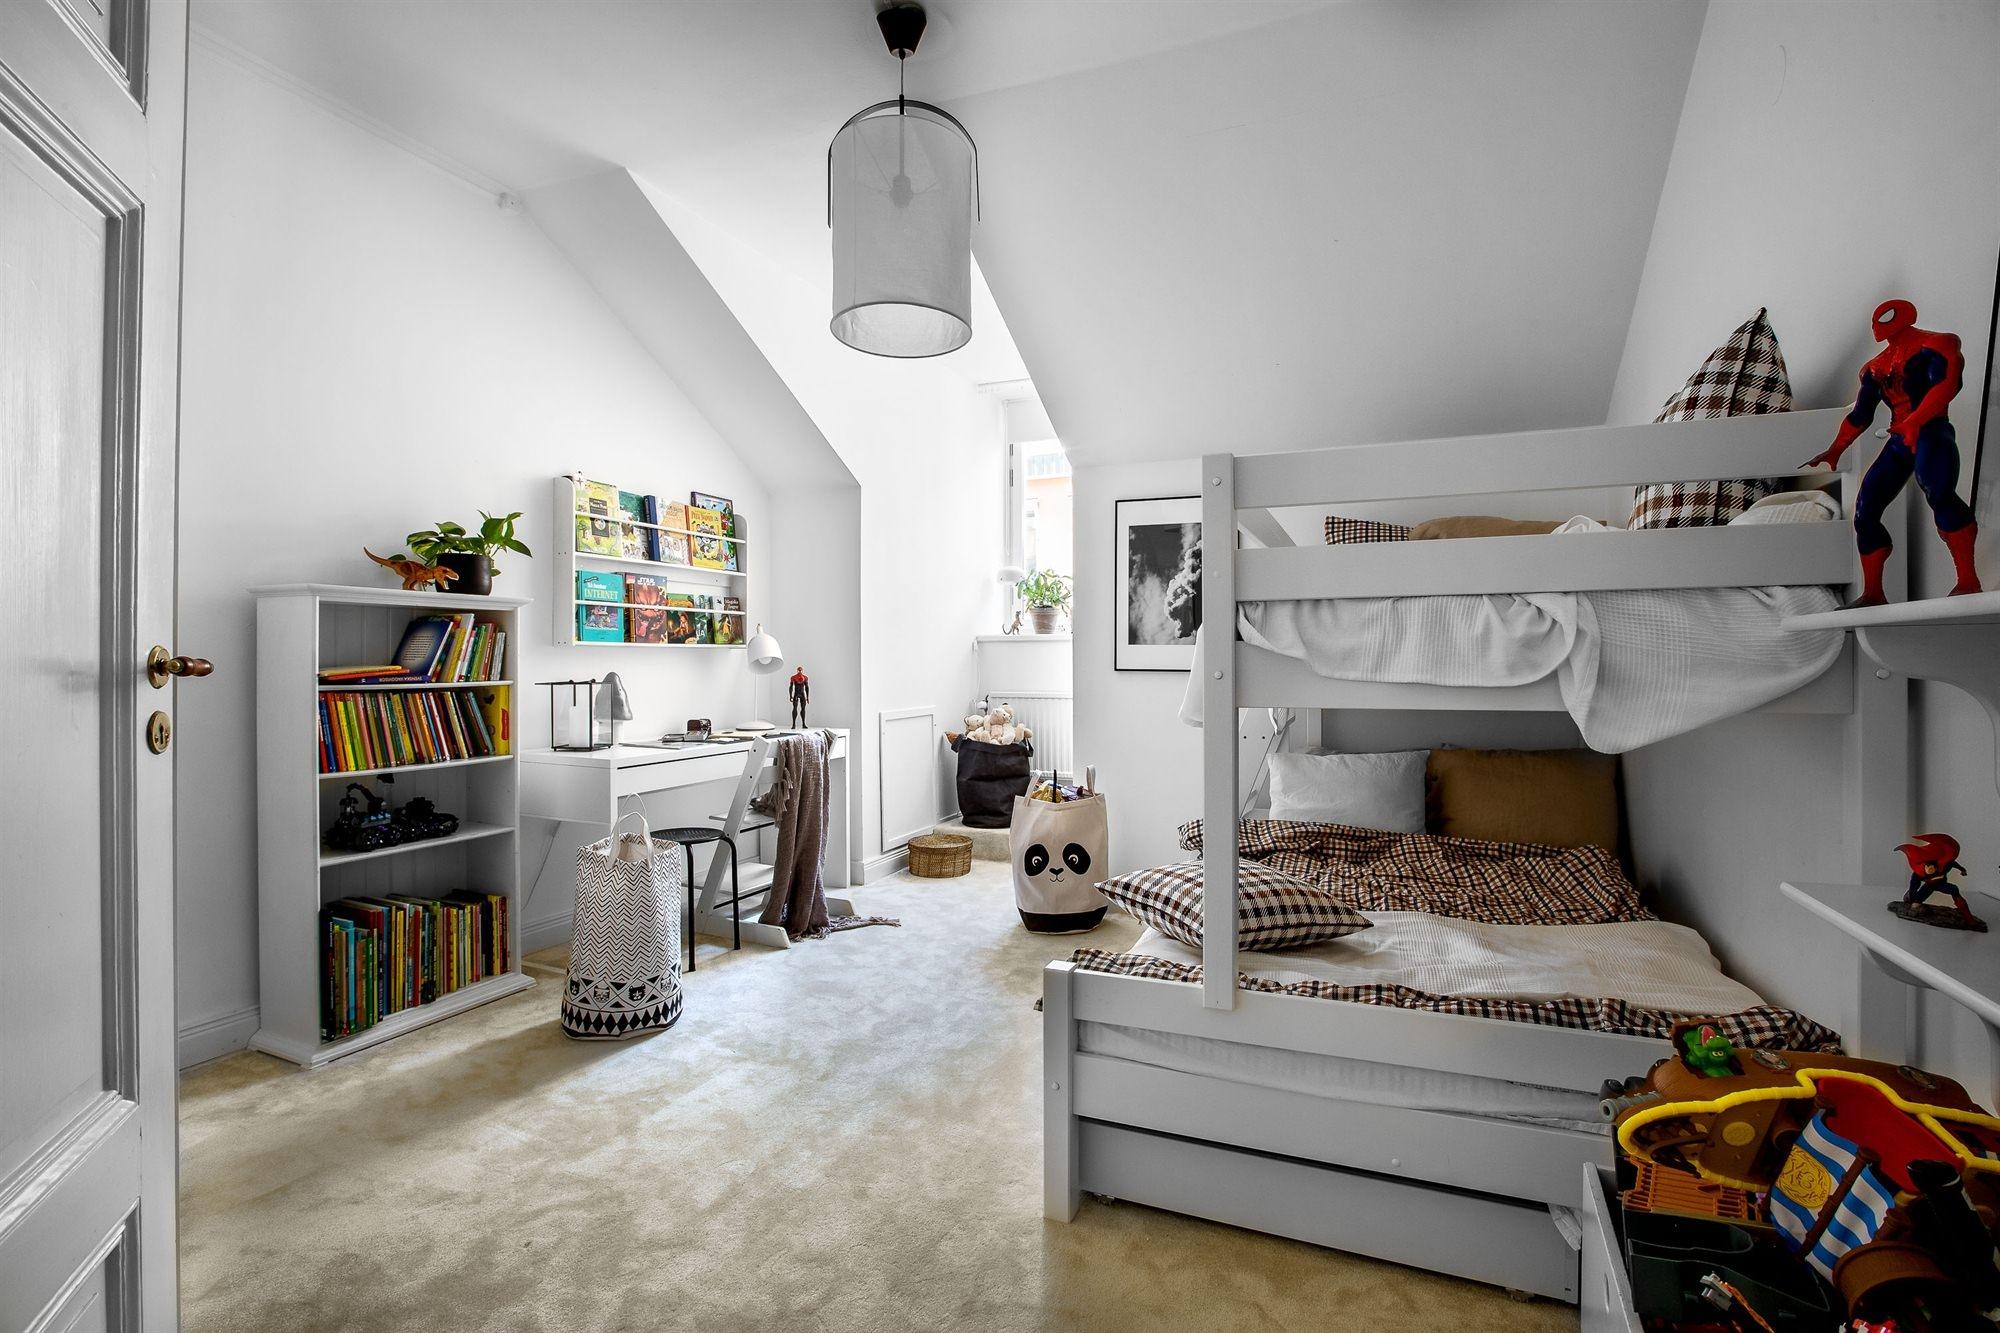 мансарда детская комната двухъярусная кровать